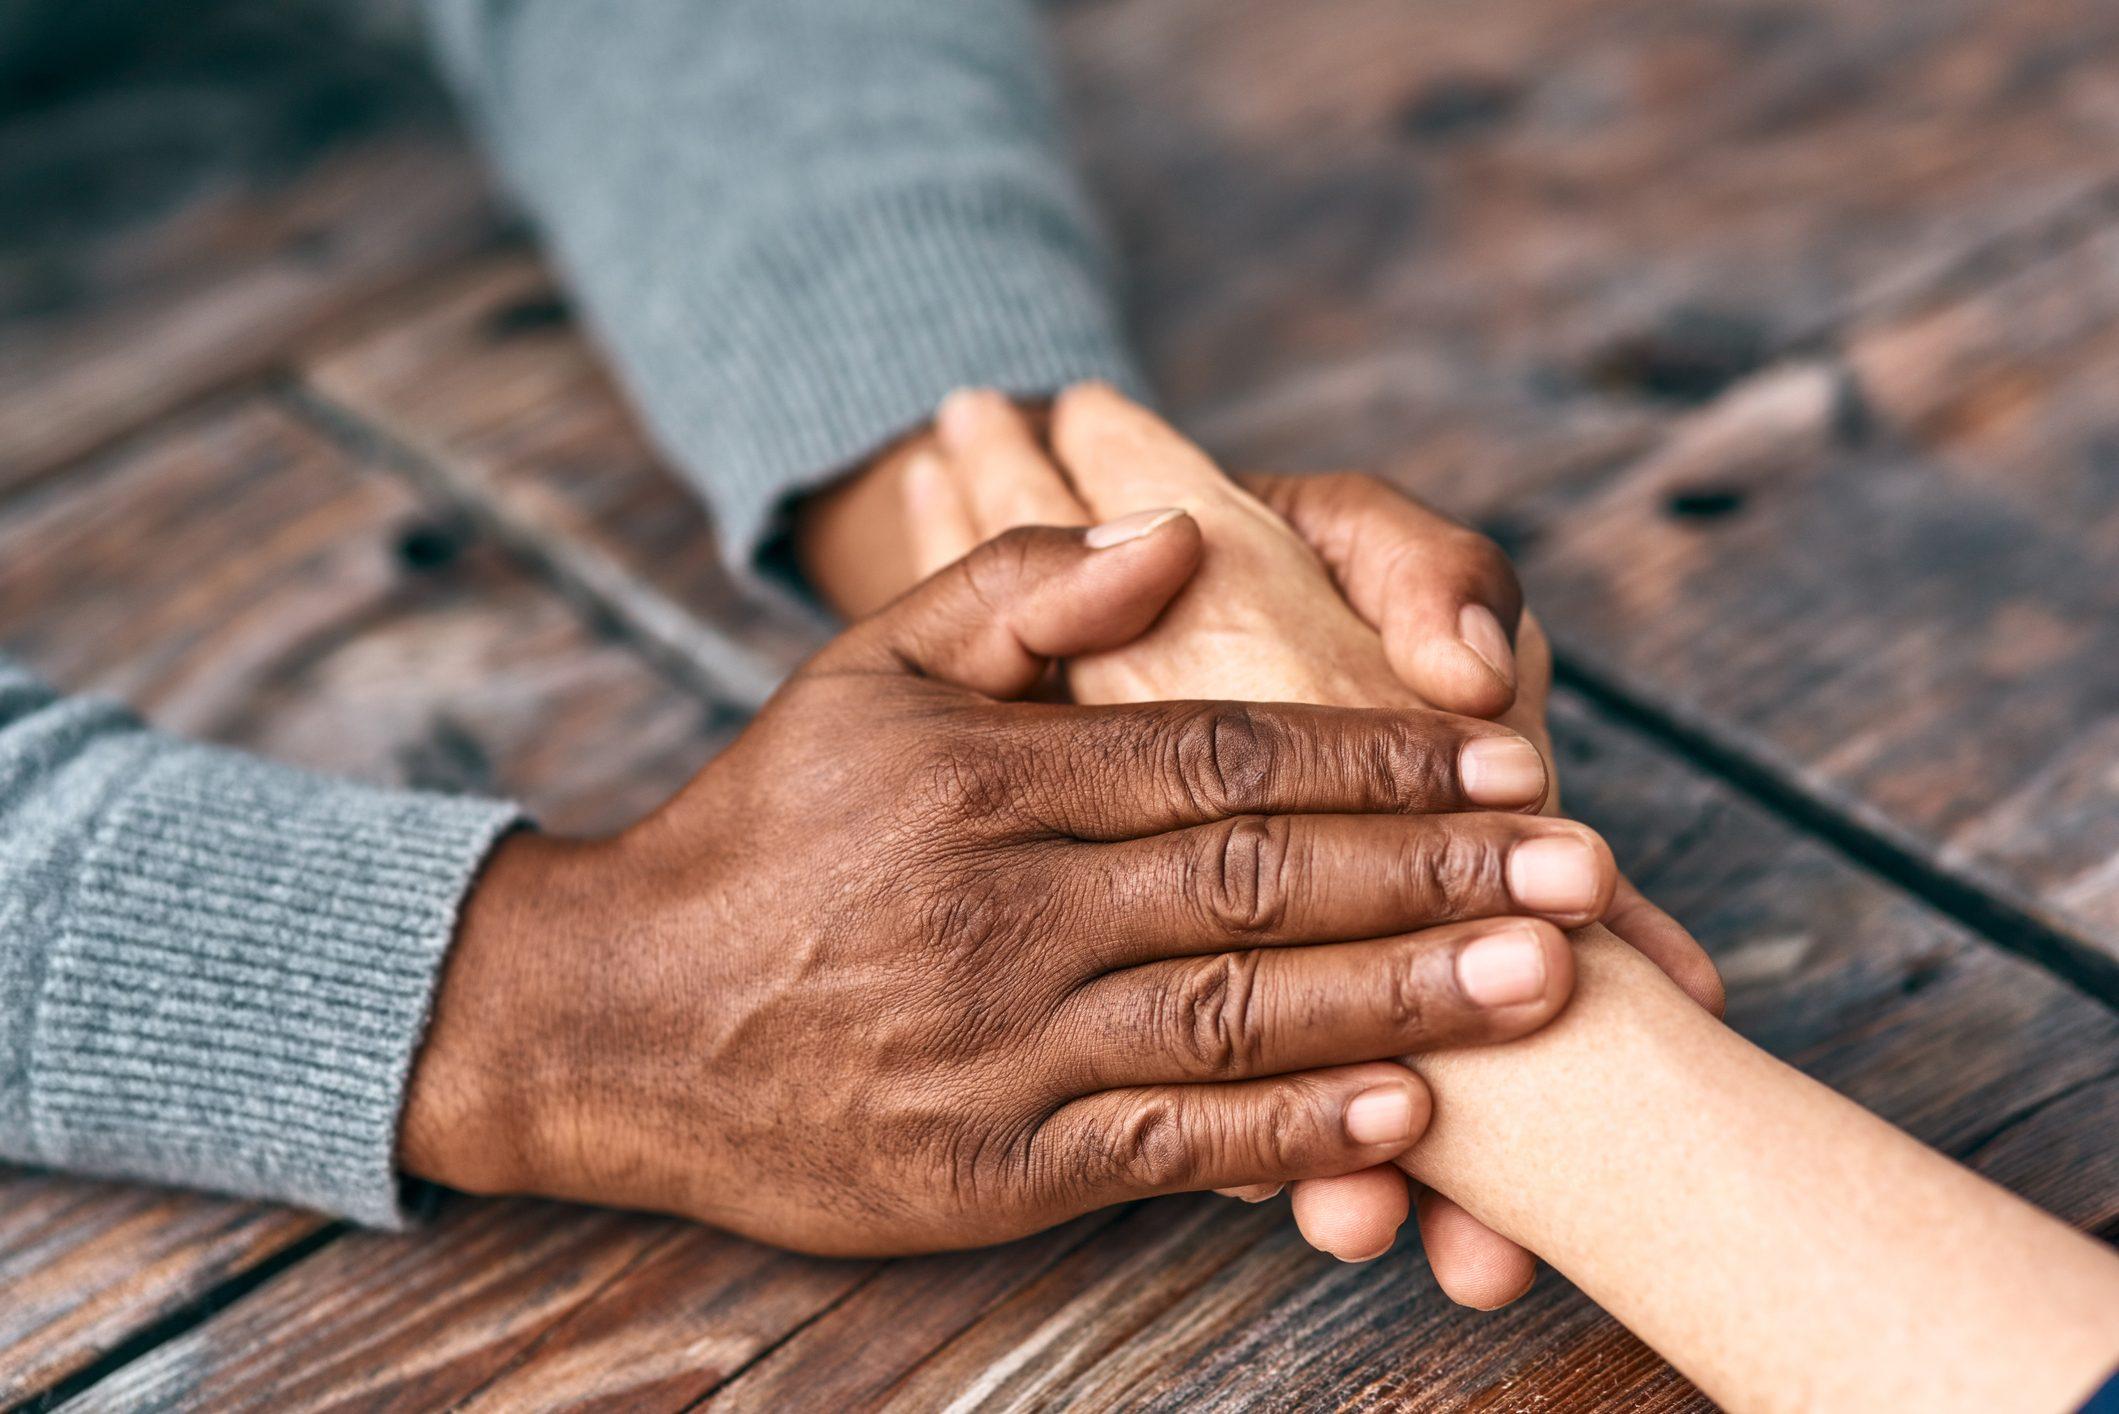 interracial couple discrimination black lives matter